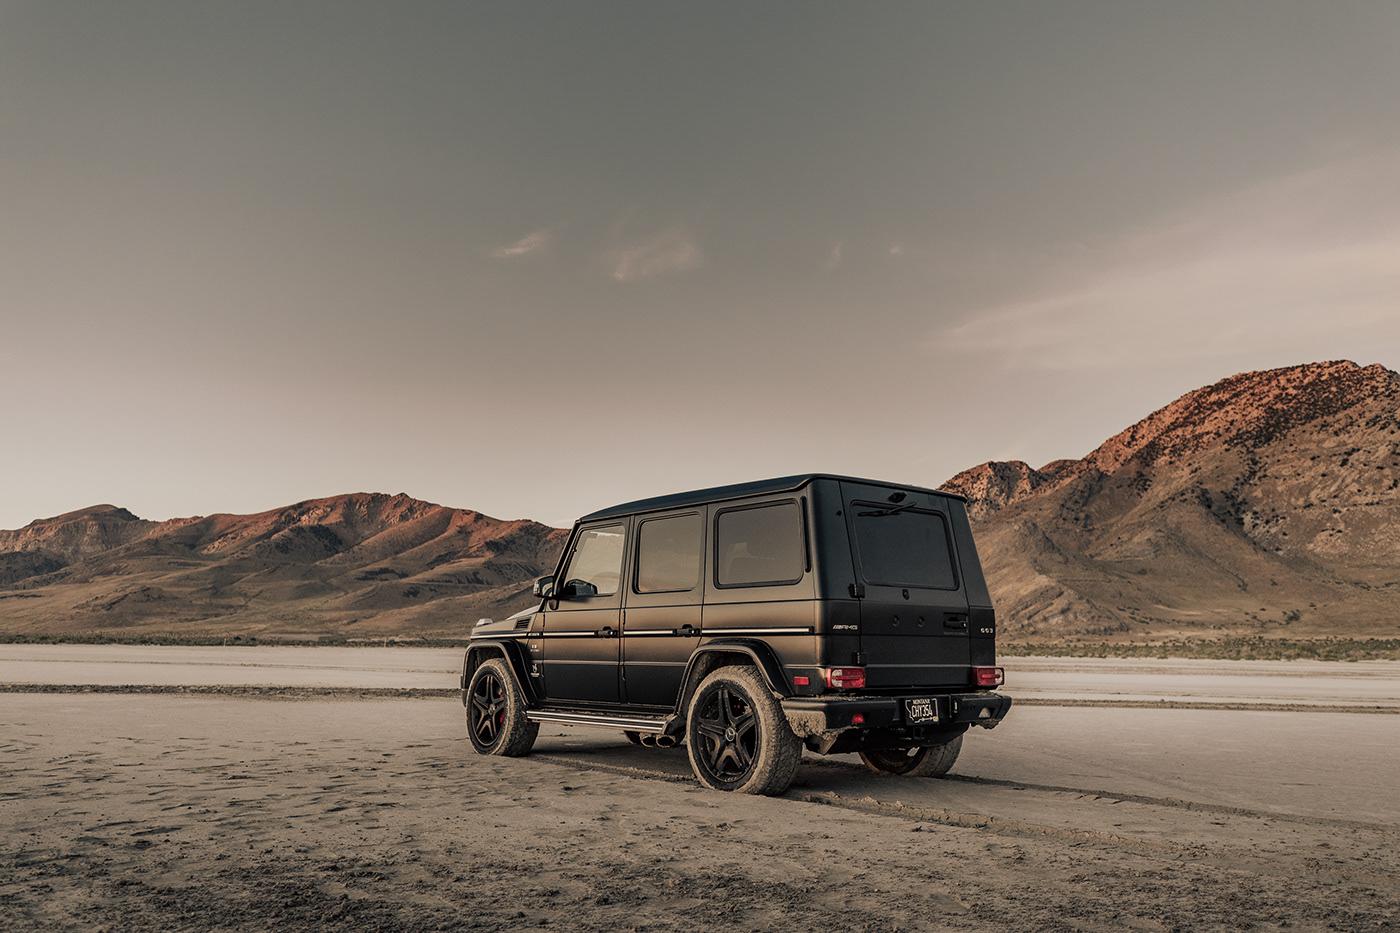 retouching  Cars automotive   action Landscape Photography  Behance lifestyle lanscape night